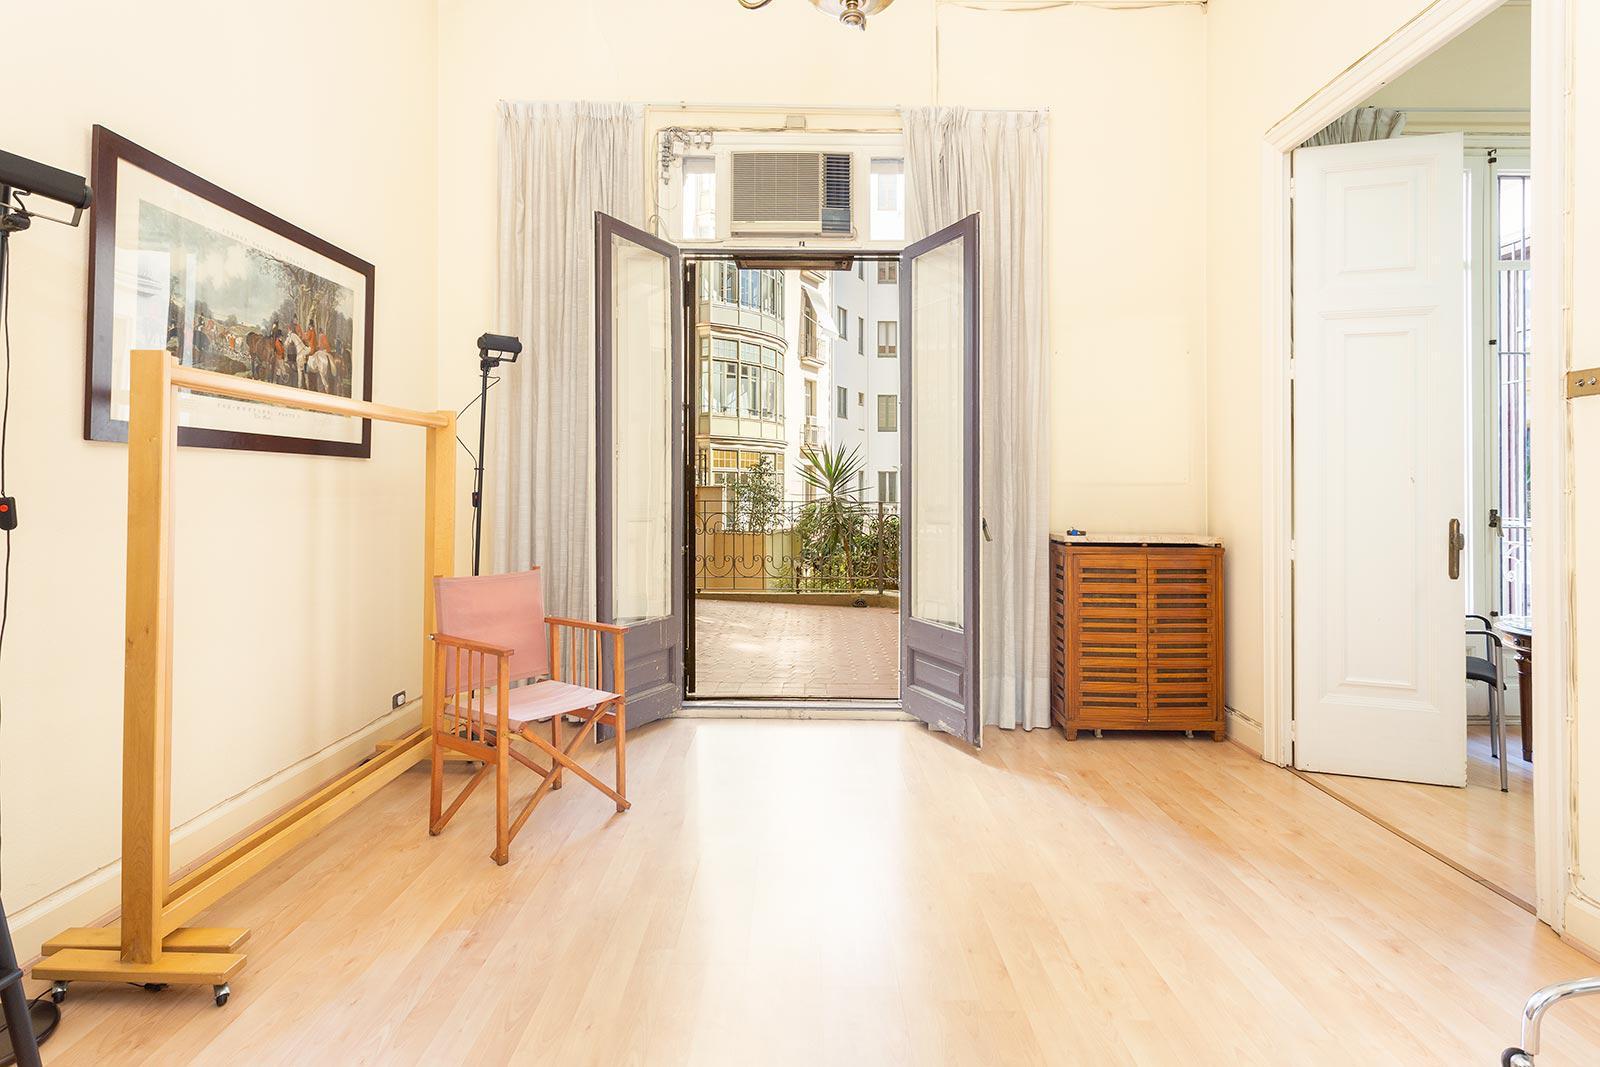 214993 Apartamento en venda en Eixample, Dreta Eixample 18